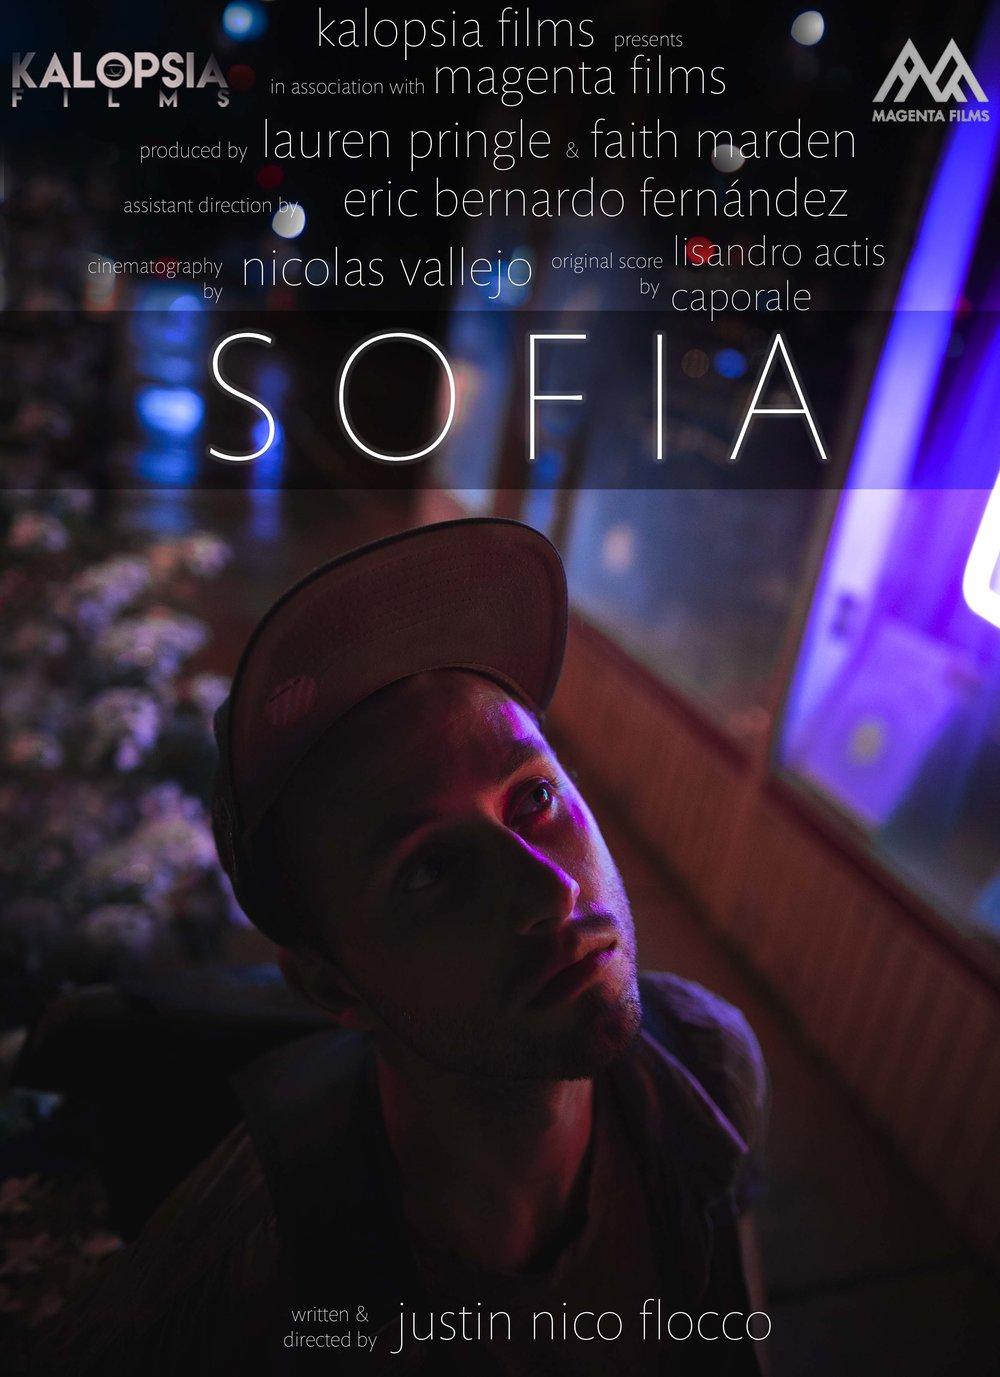 SOFIA_POSTER_2017_Small.jpg